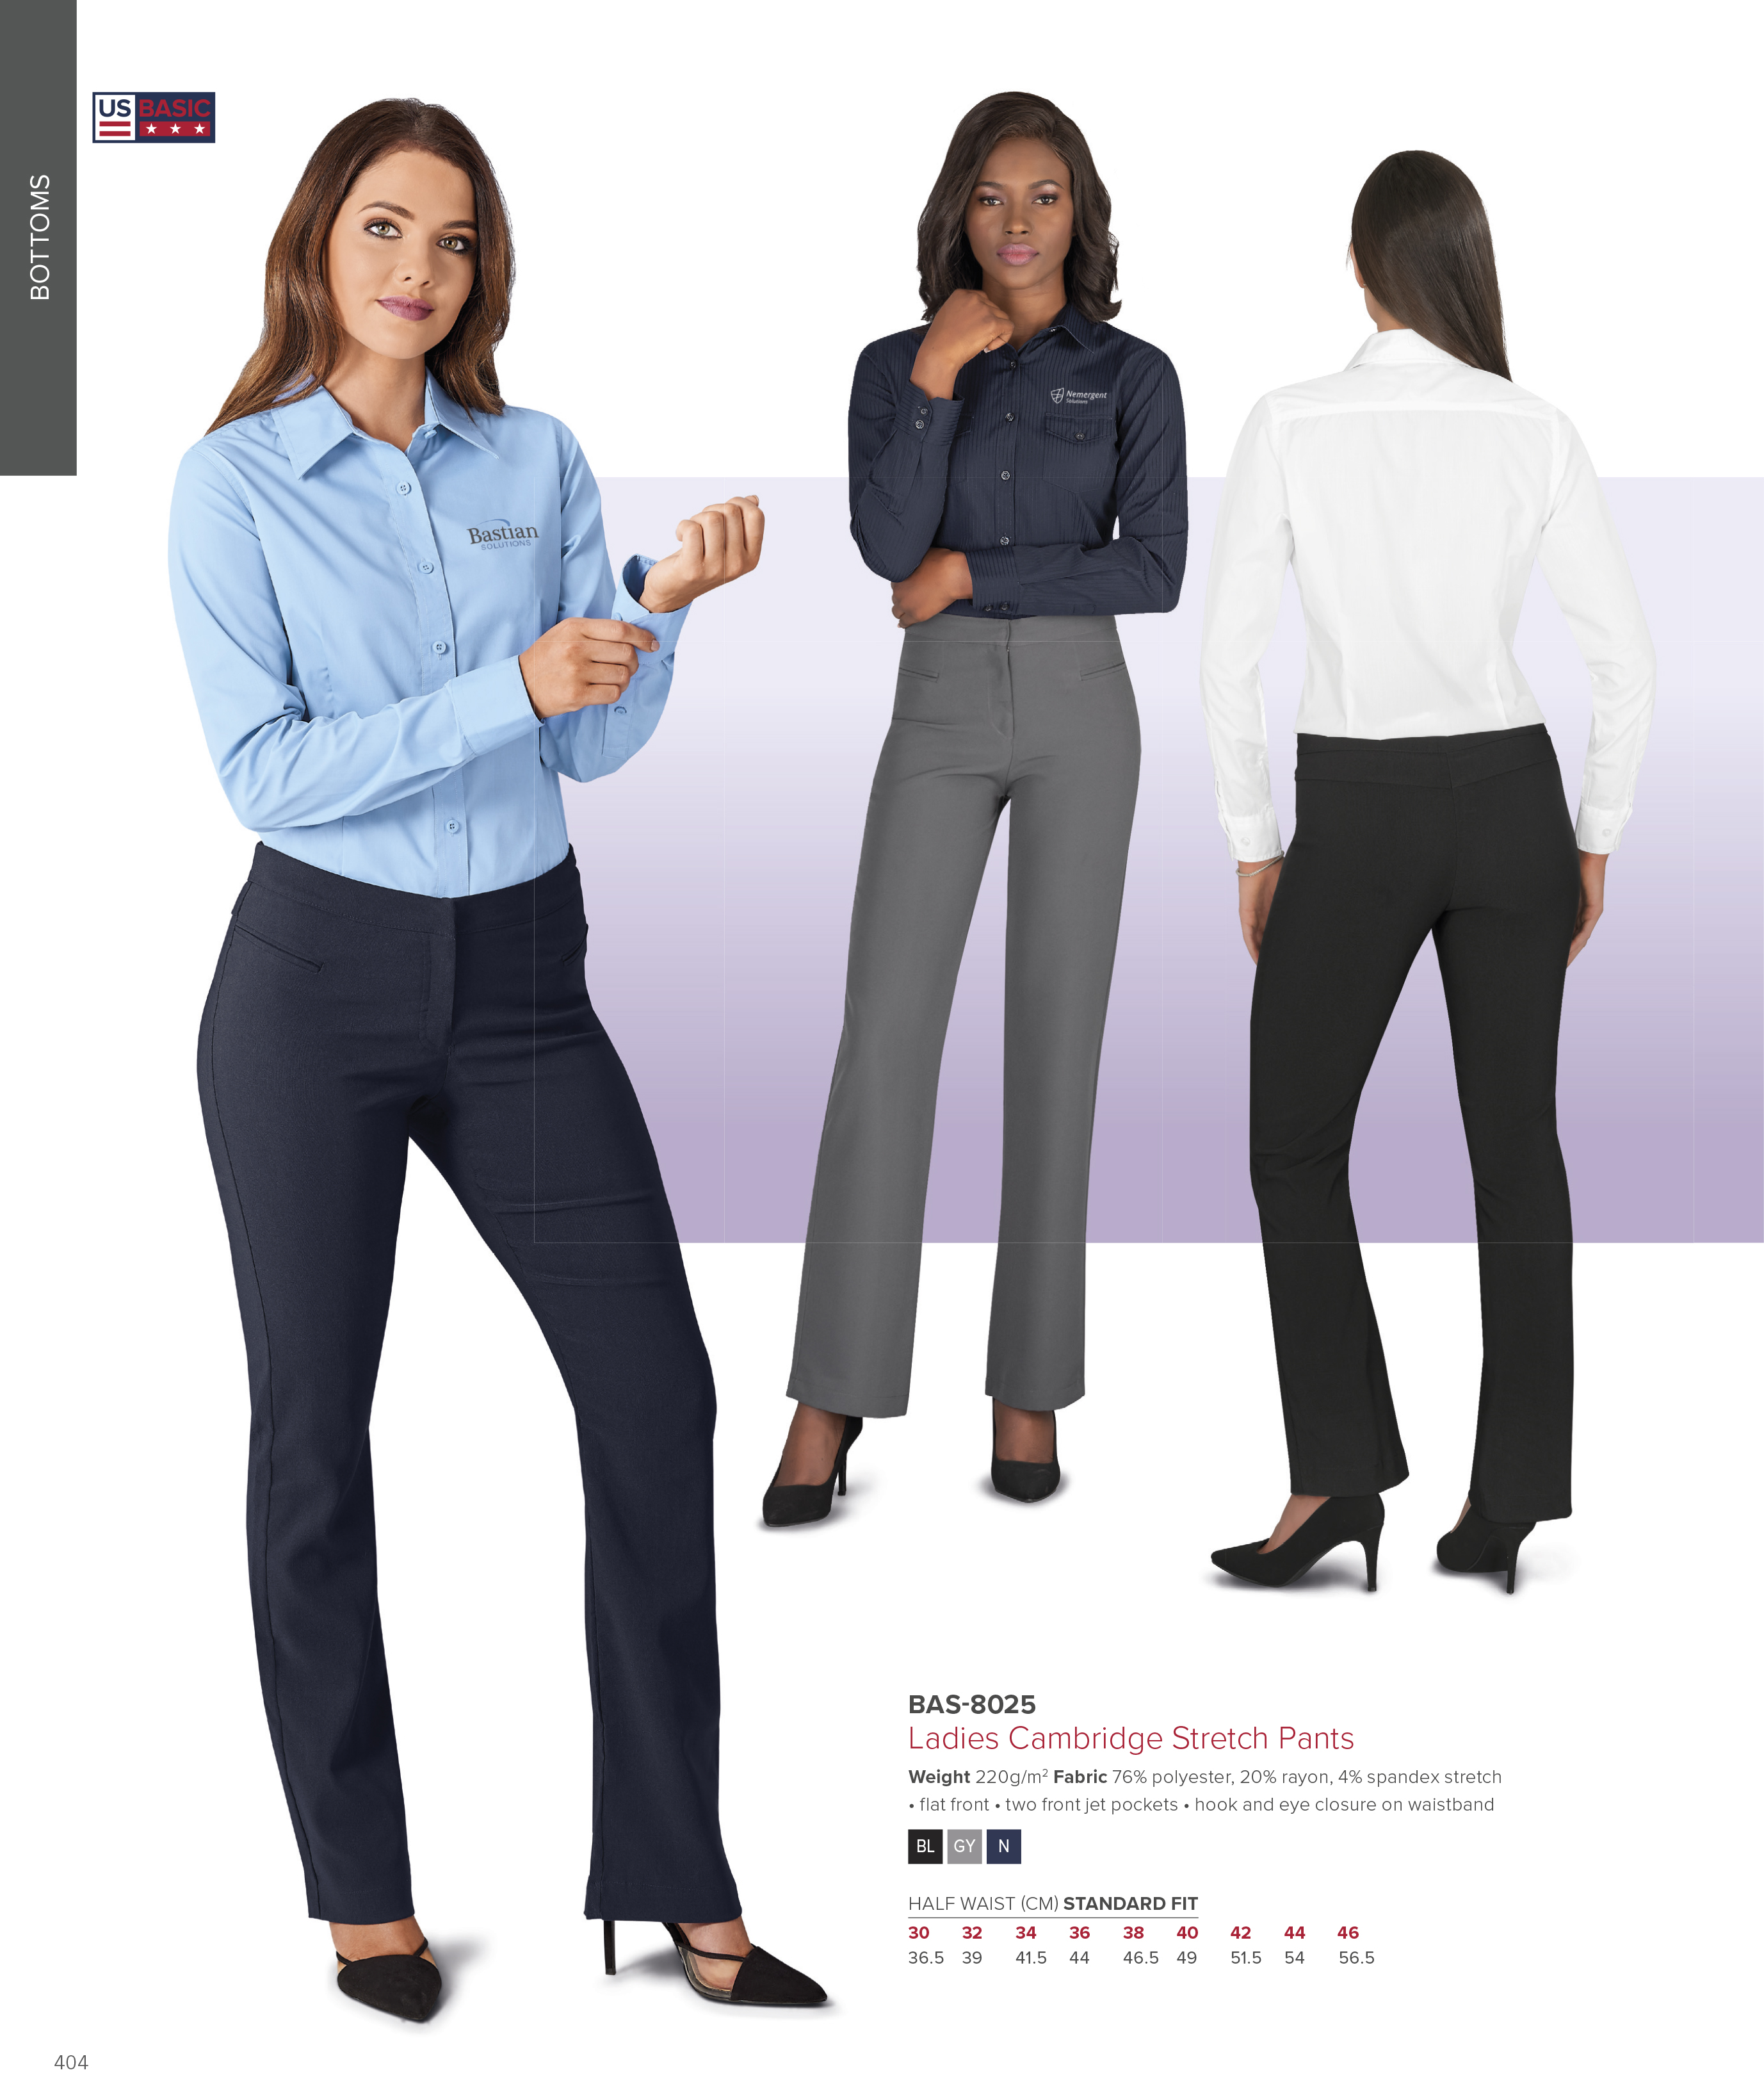 US Basic Ladies Cambridge Stretch Pants | BAS-8025